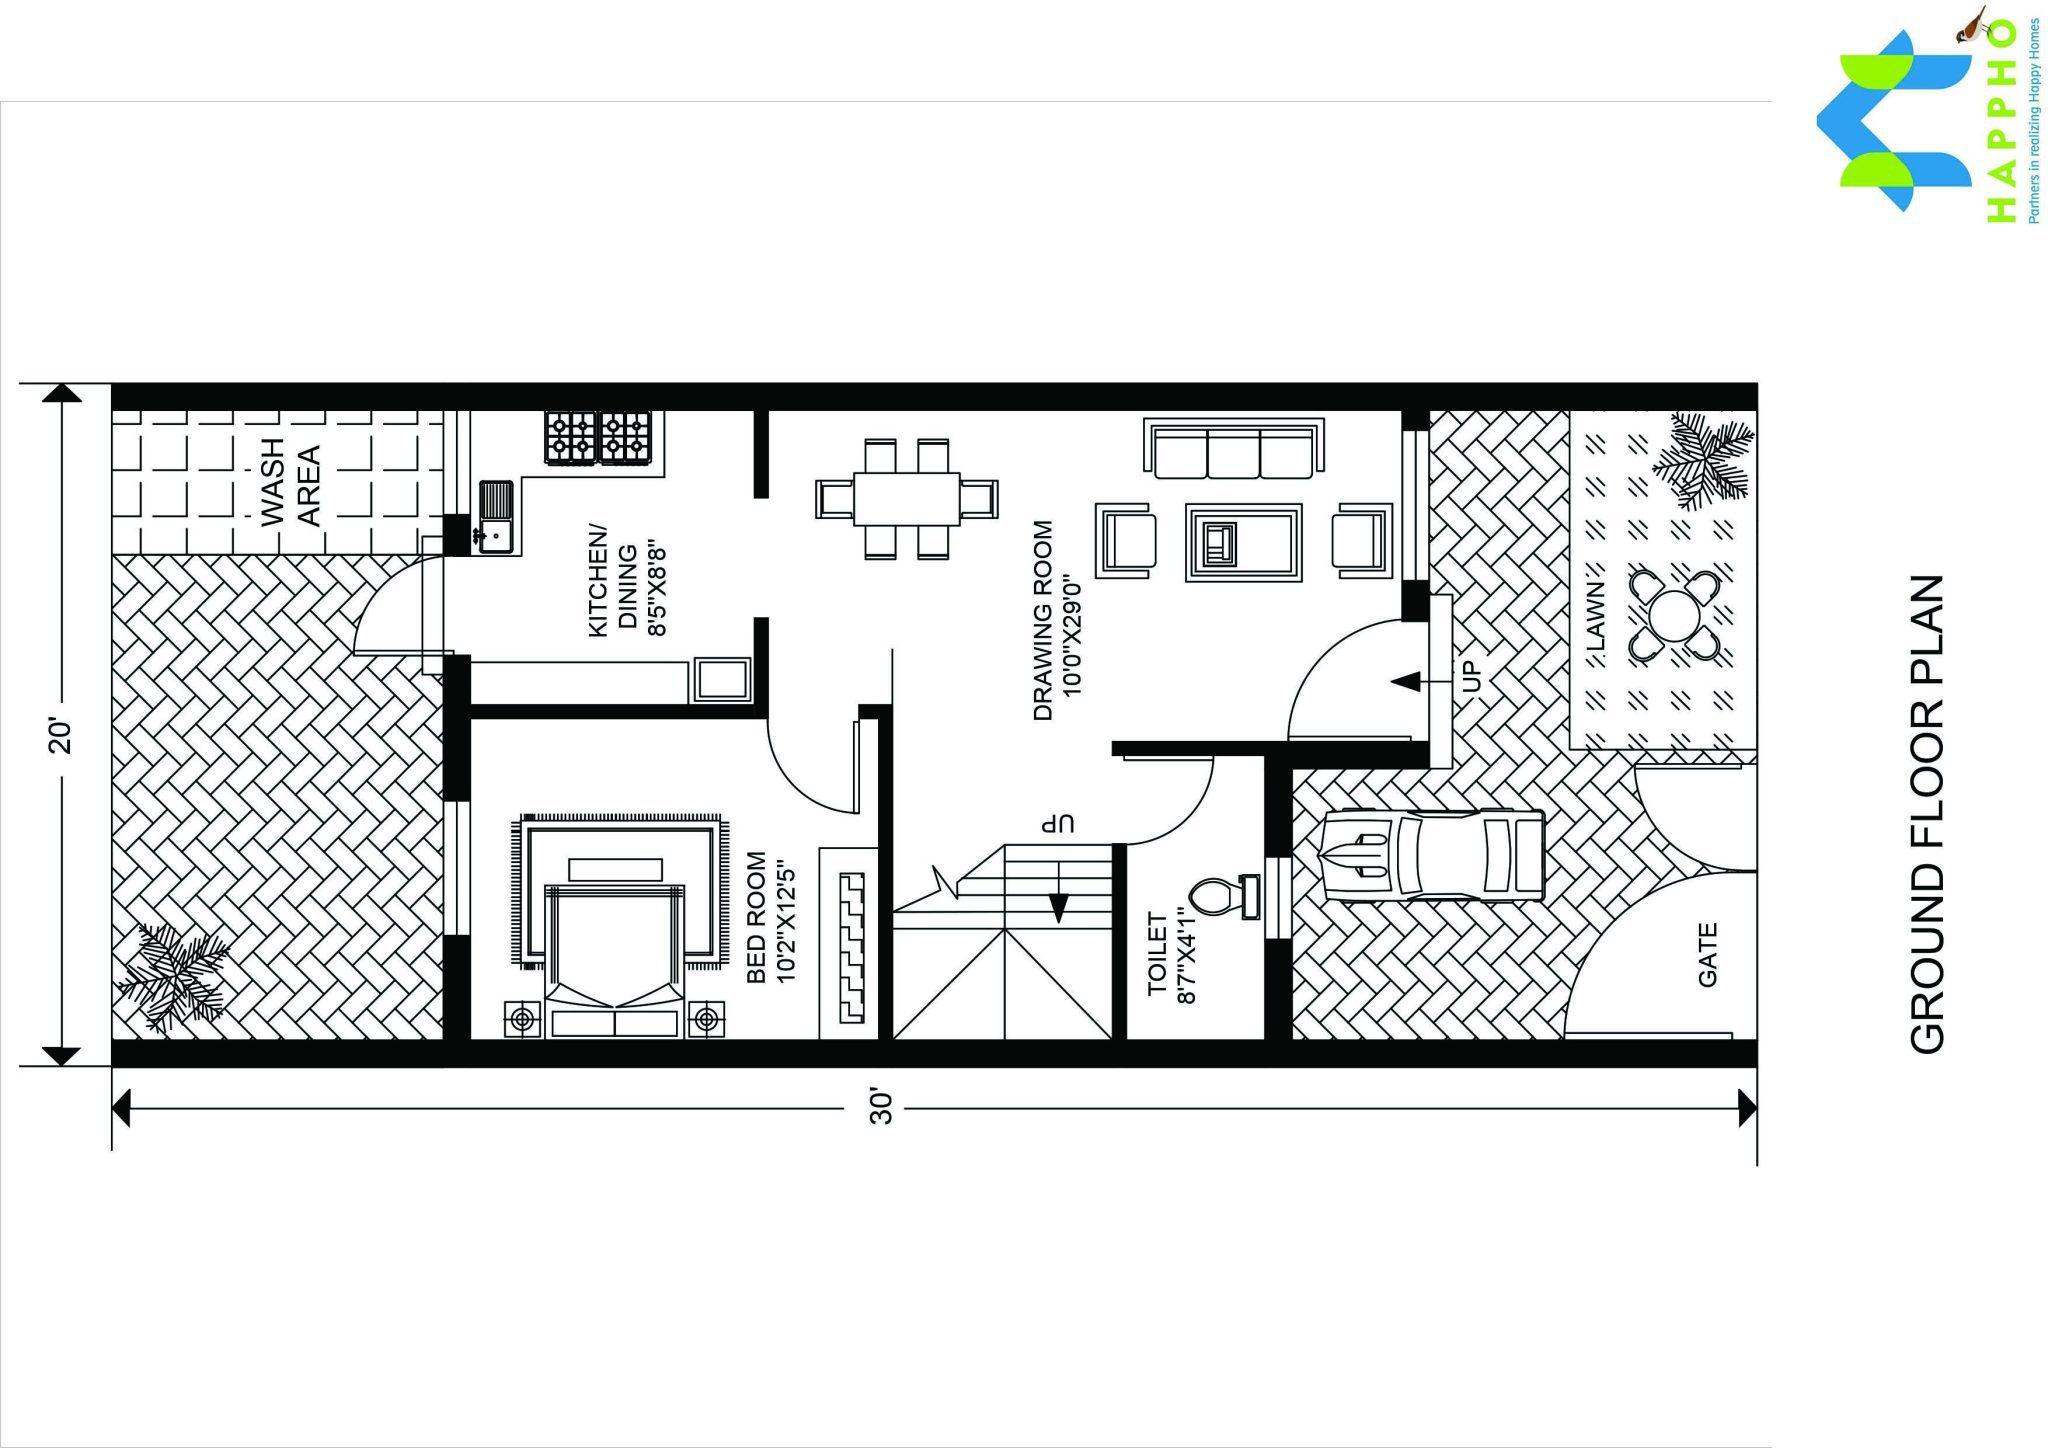 3 bhk floor plan for 30 x 20 feet plot 600 square feet for 120 square yards floor plan